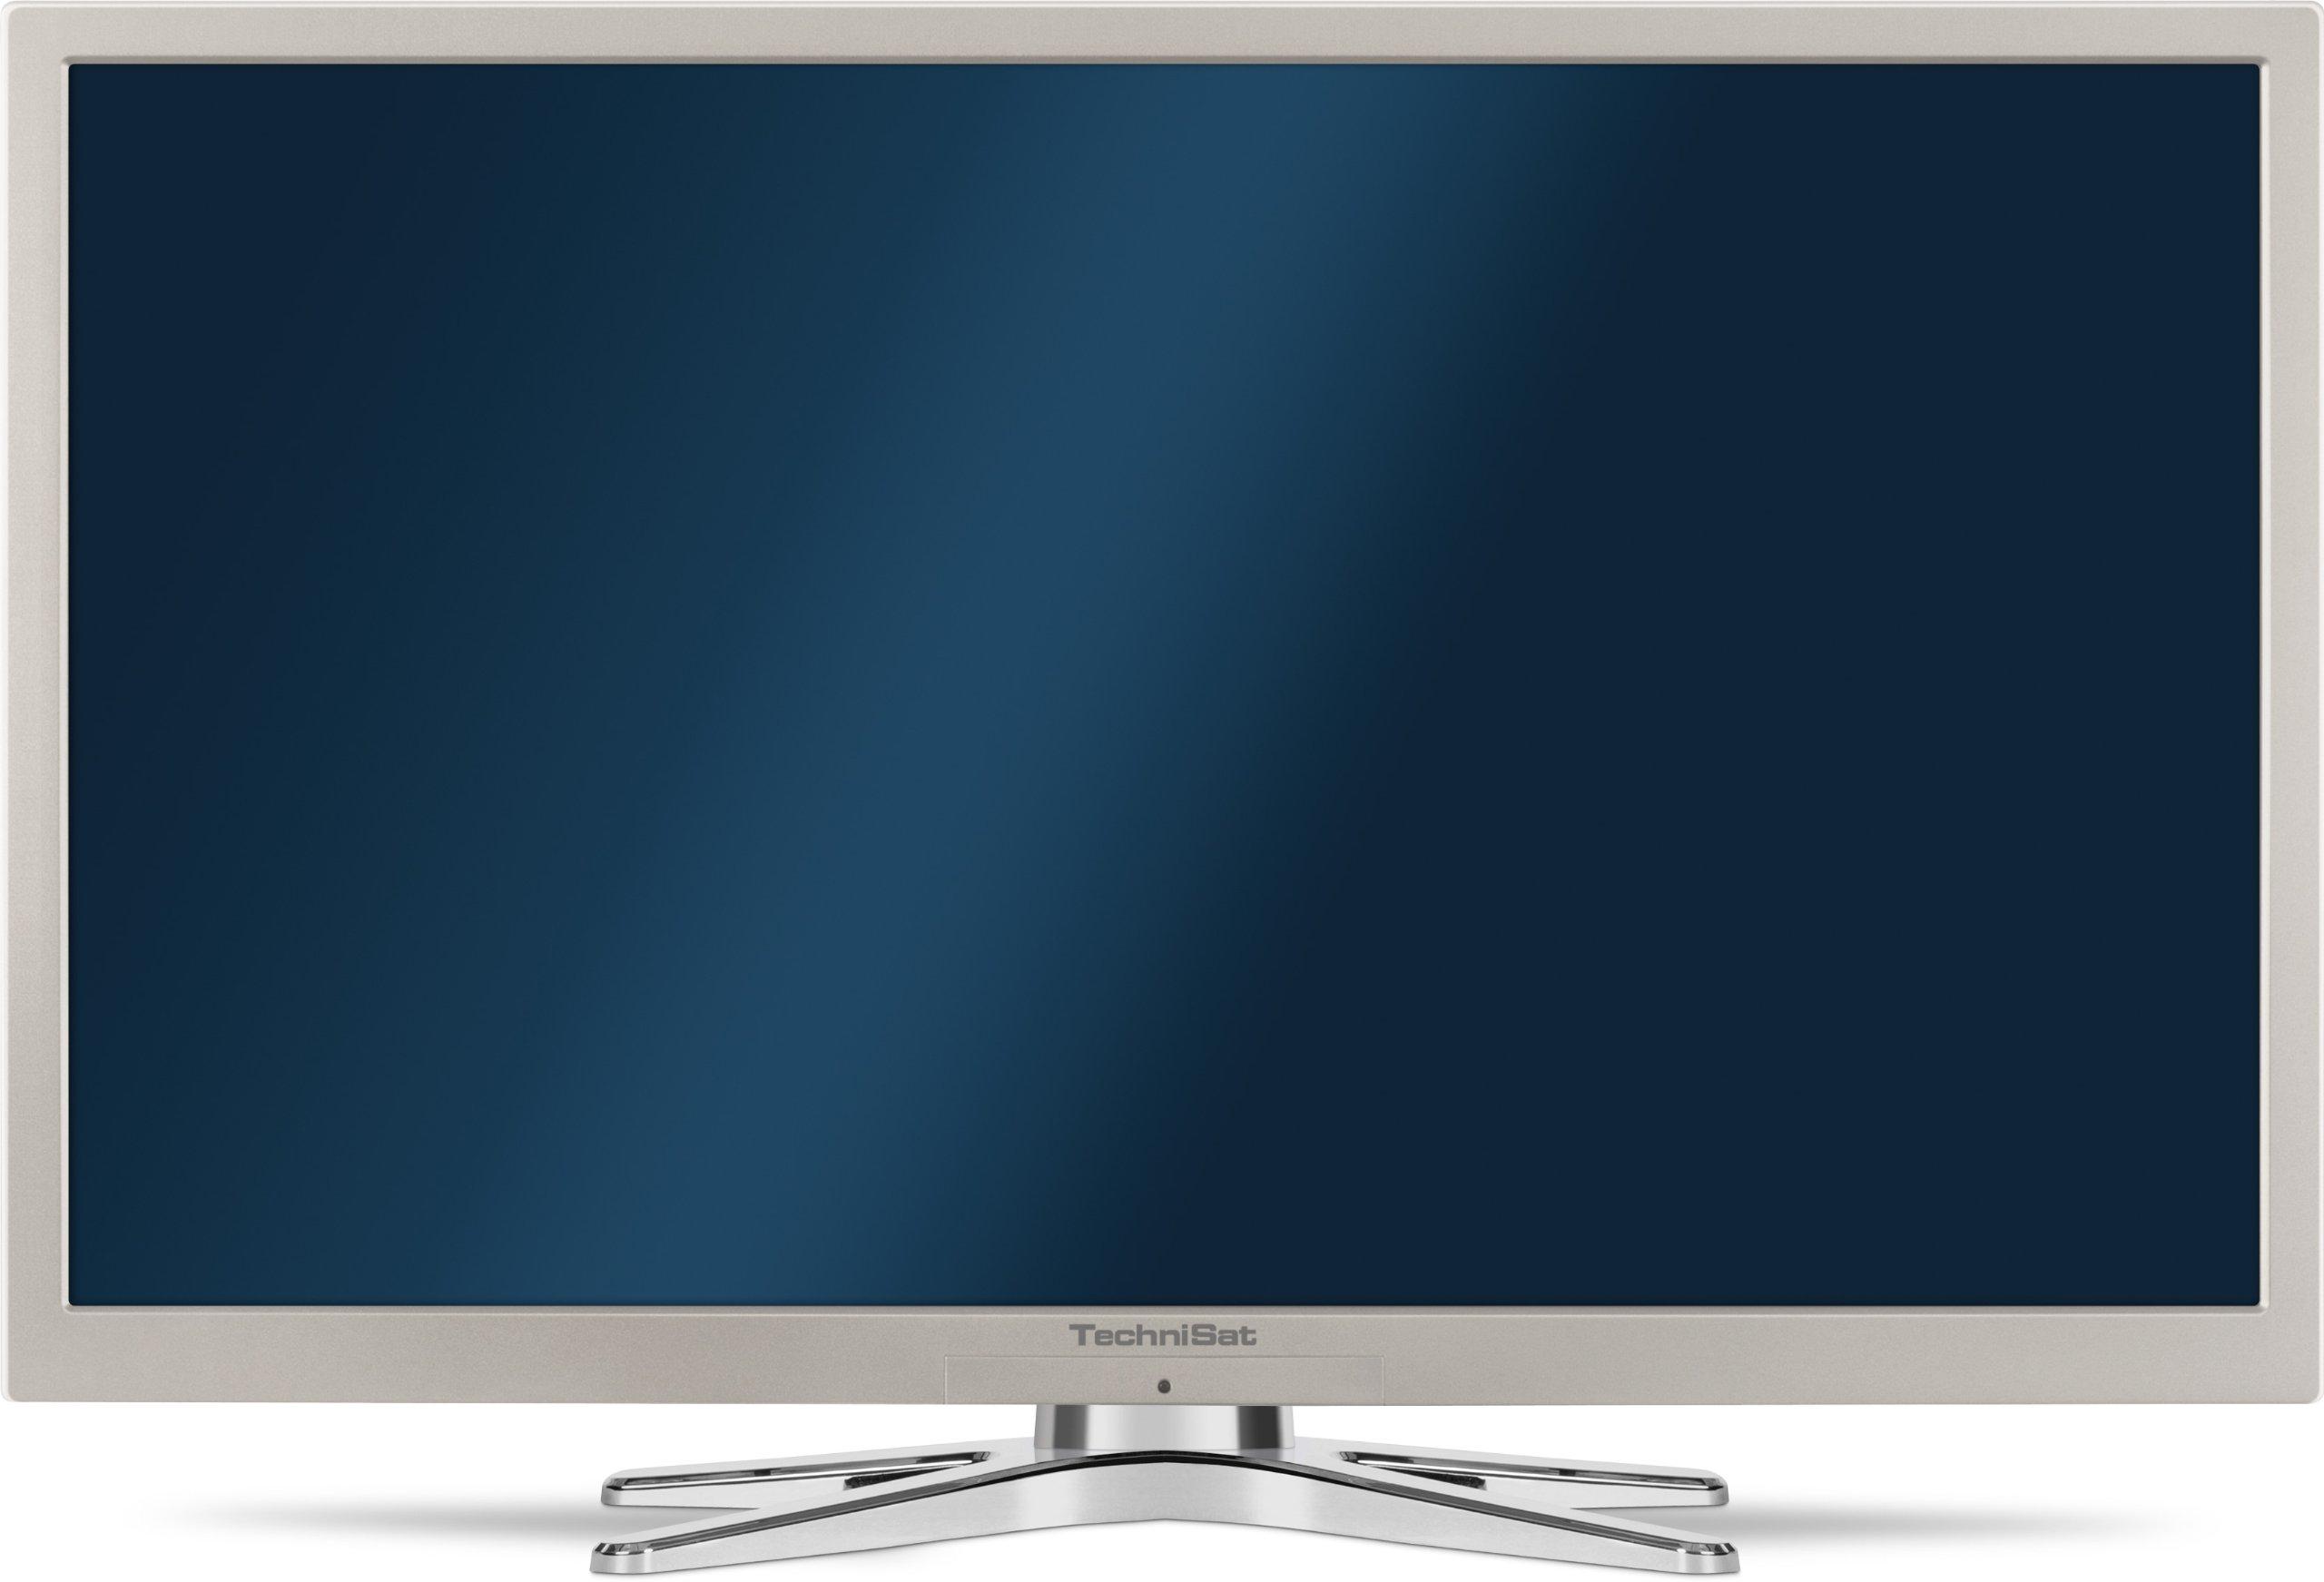 TechniSat 5022/8000 - Televisor (22